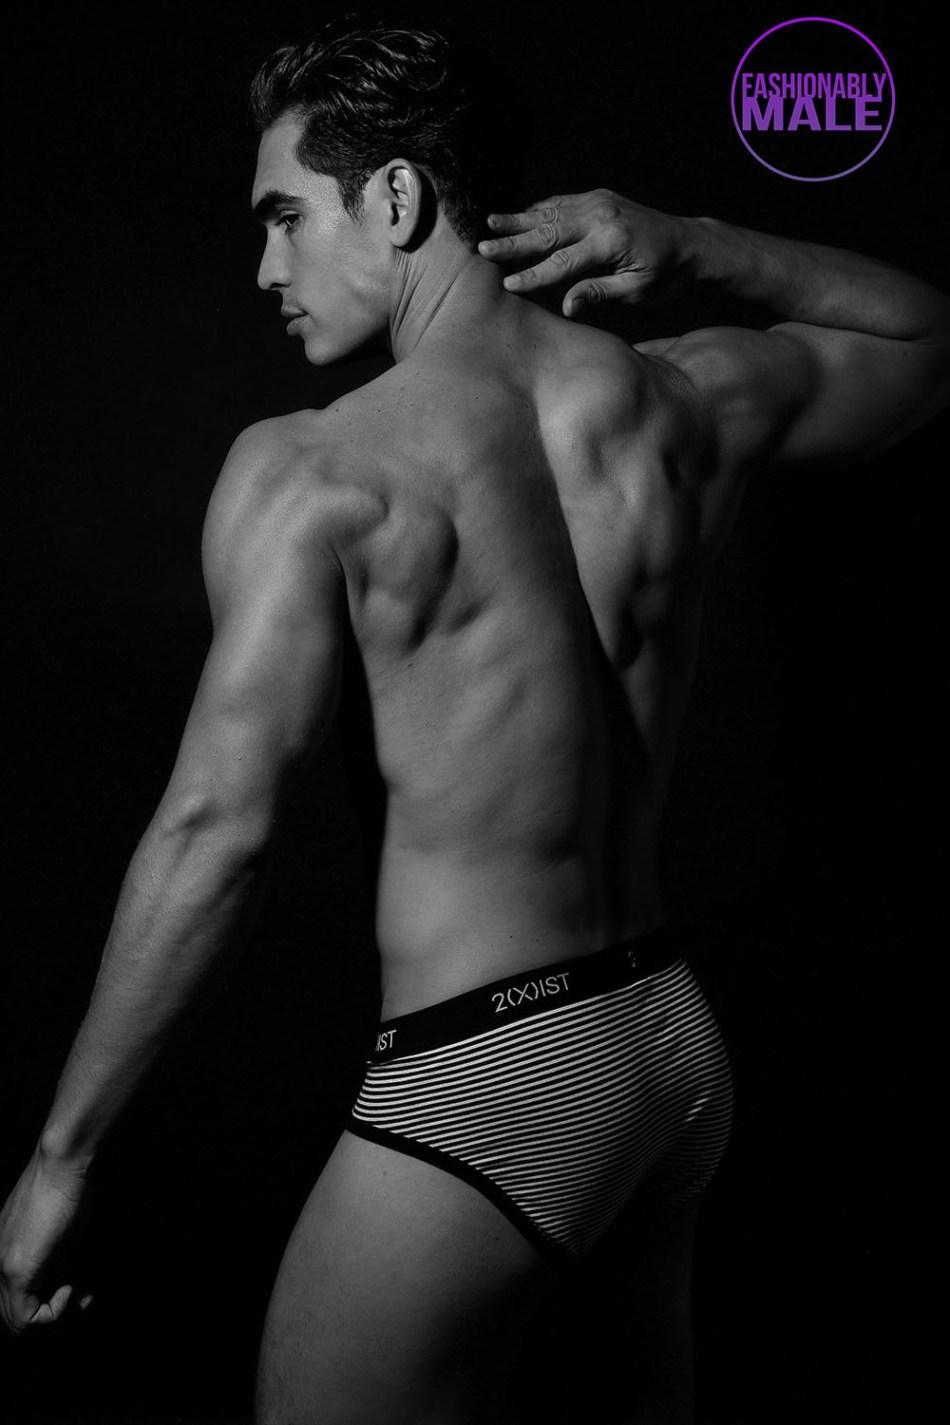 Felipe Villagrana by Afif Kattan for Fashionably Male3